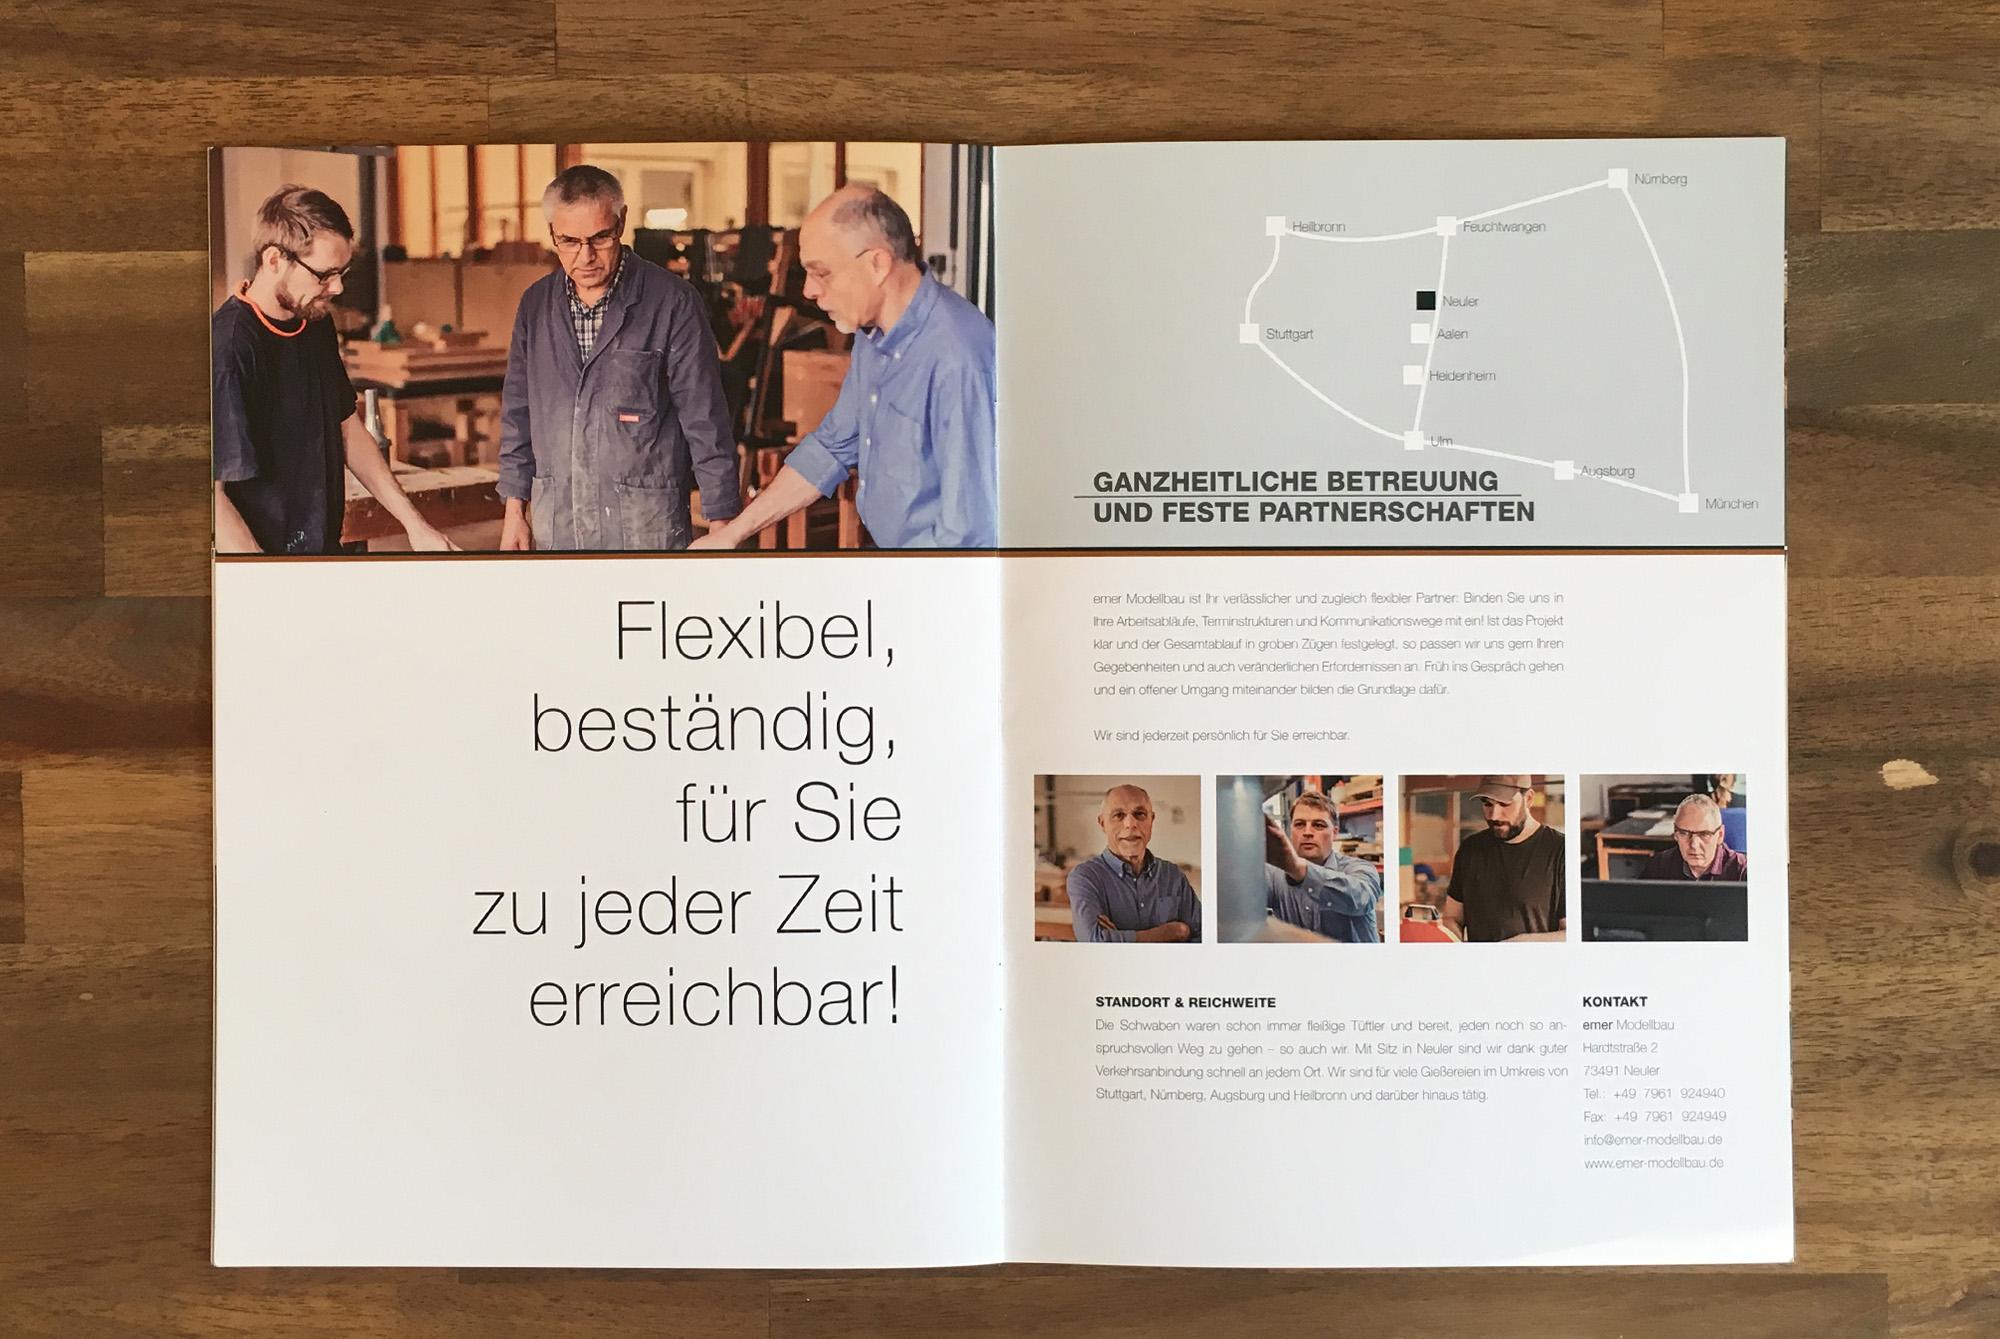 emer-modellbau-unternehmensbroschuere-05-2016